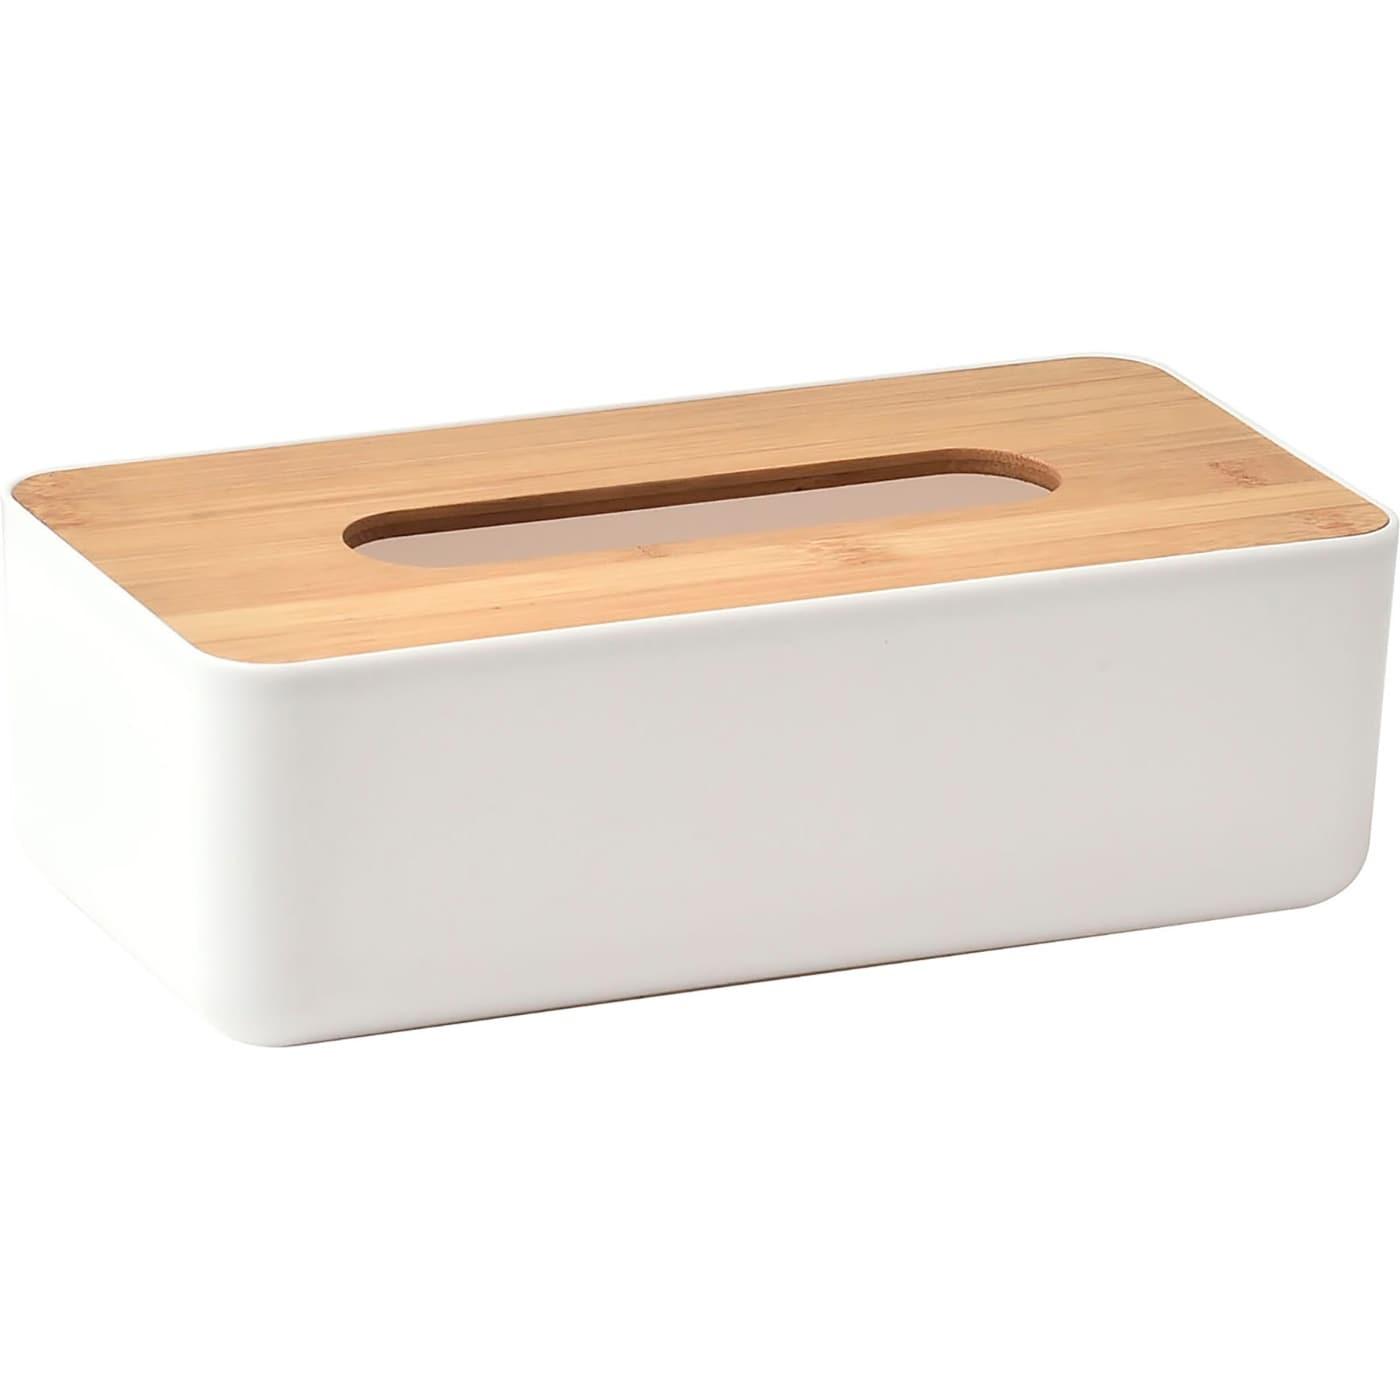 Padang Rectangular Facial Tissue Holder Box Cover White Bamboo White Overstock 31918867